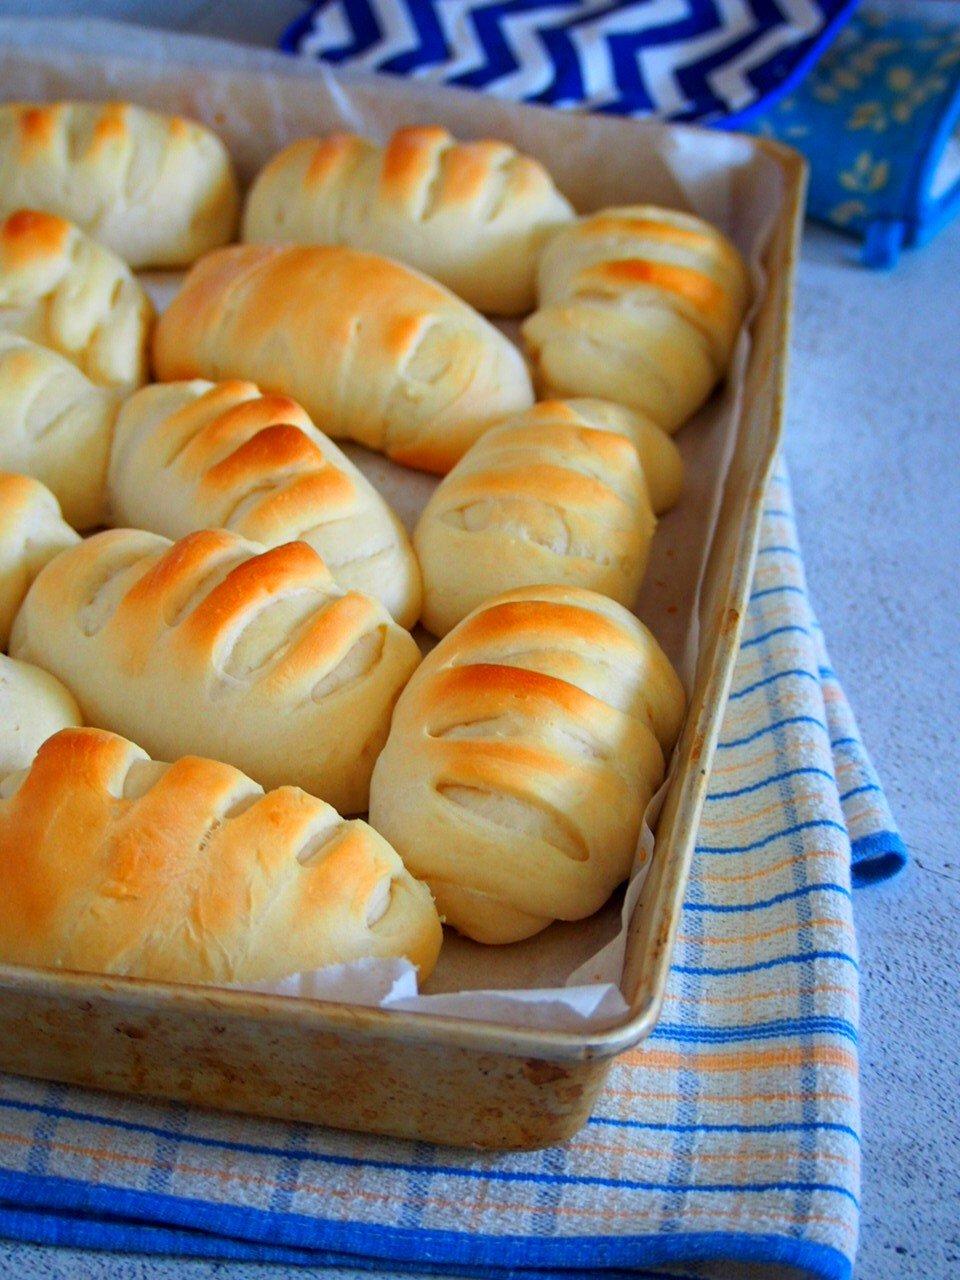 Freshly baked pan de leche buns.